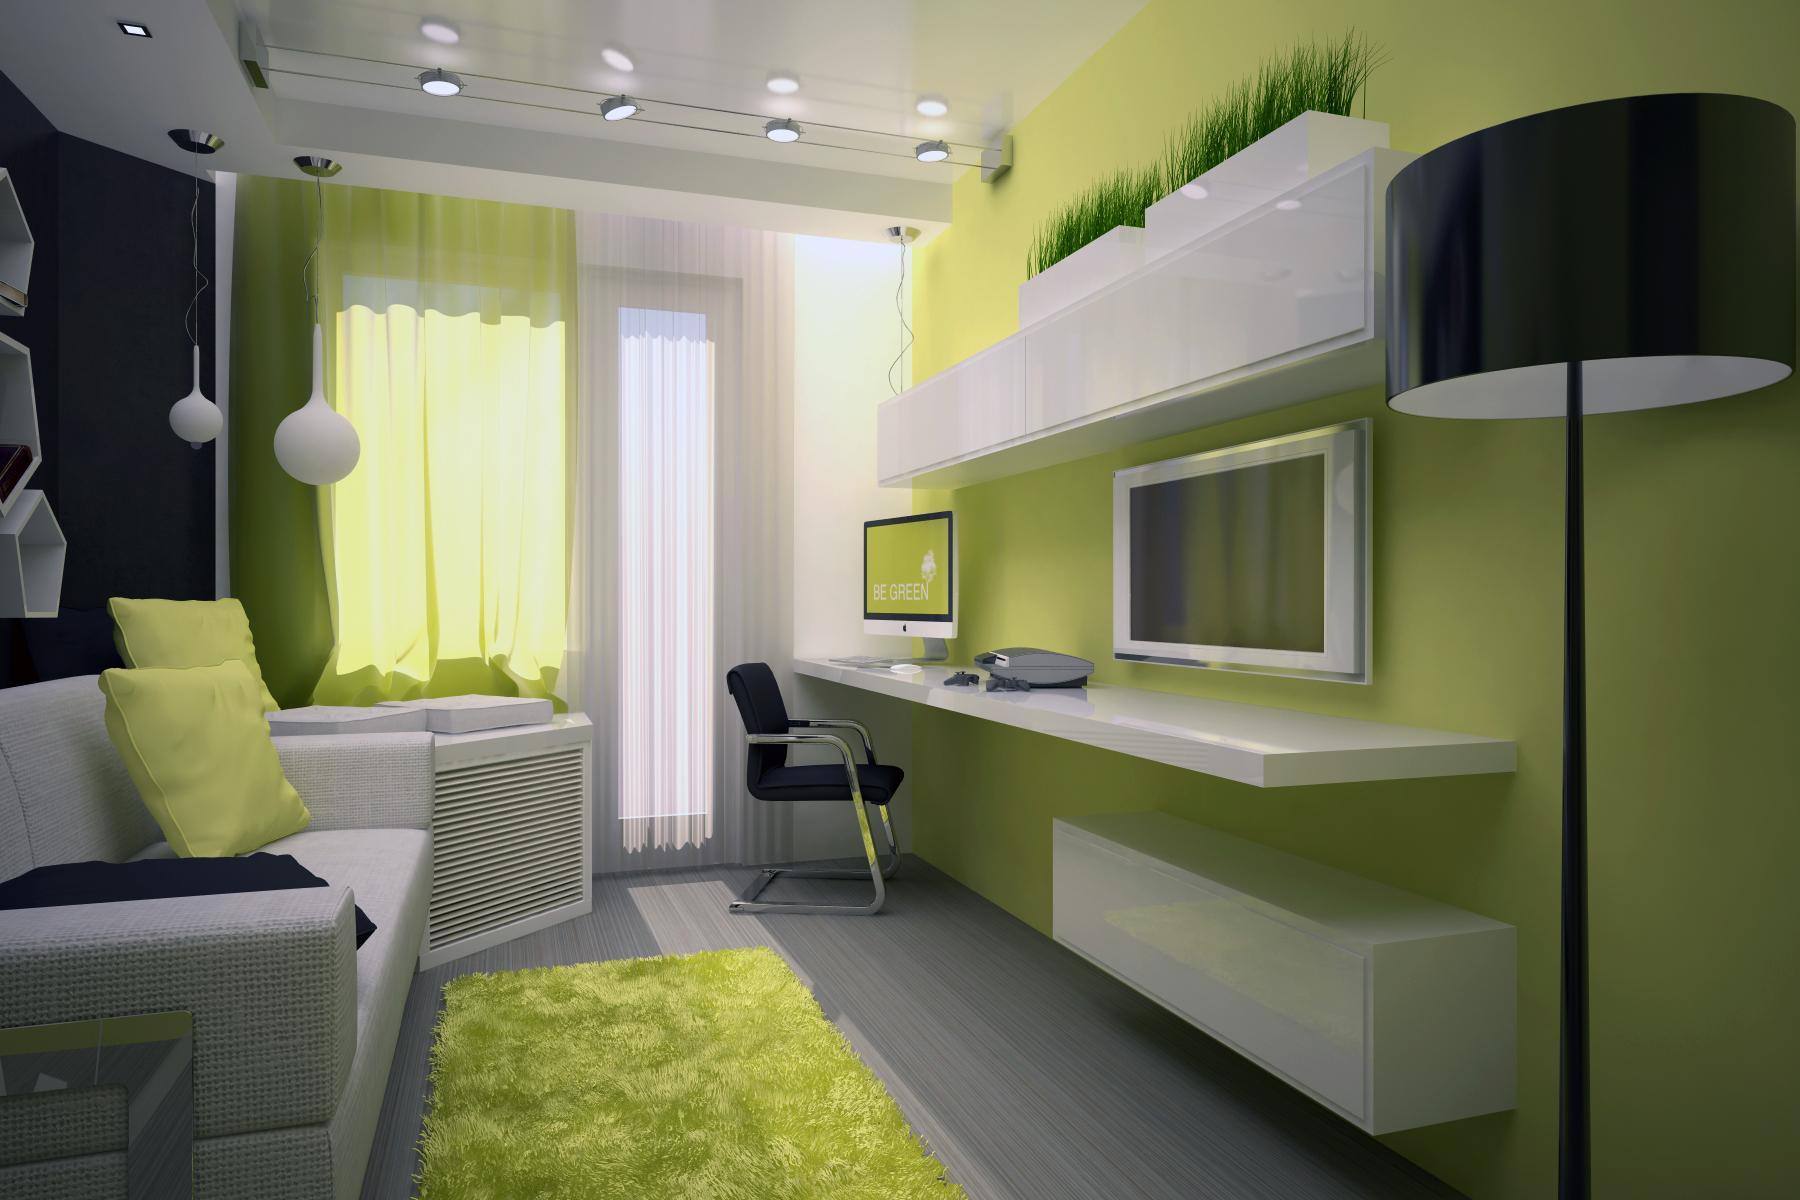 Комната 10 кв м дизайн прямоугольная